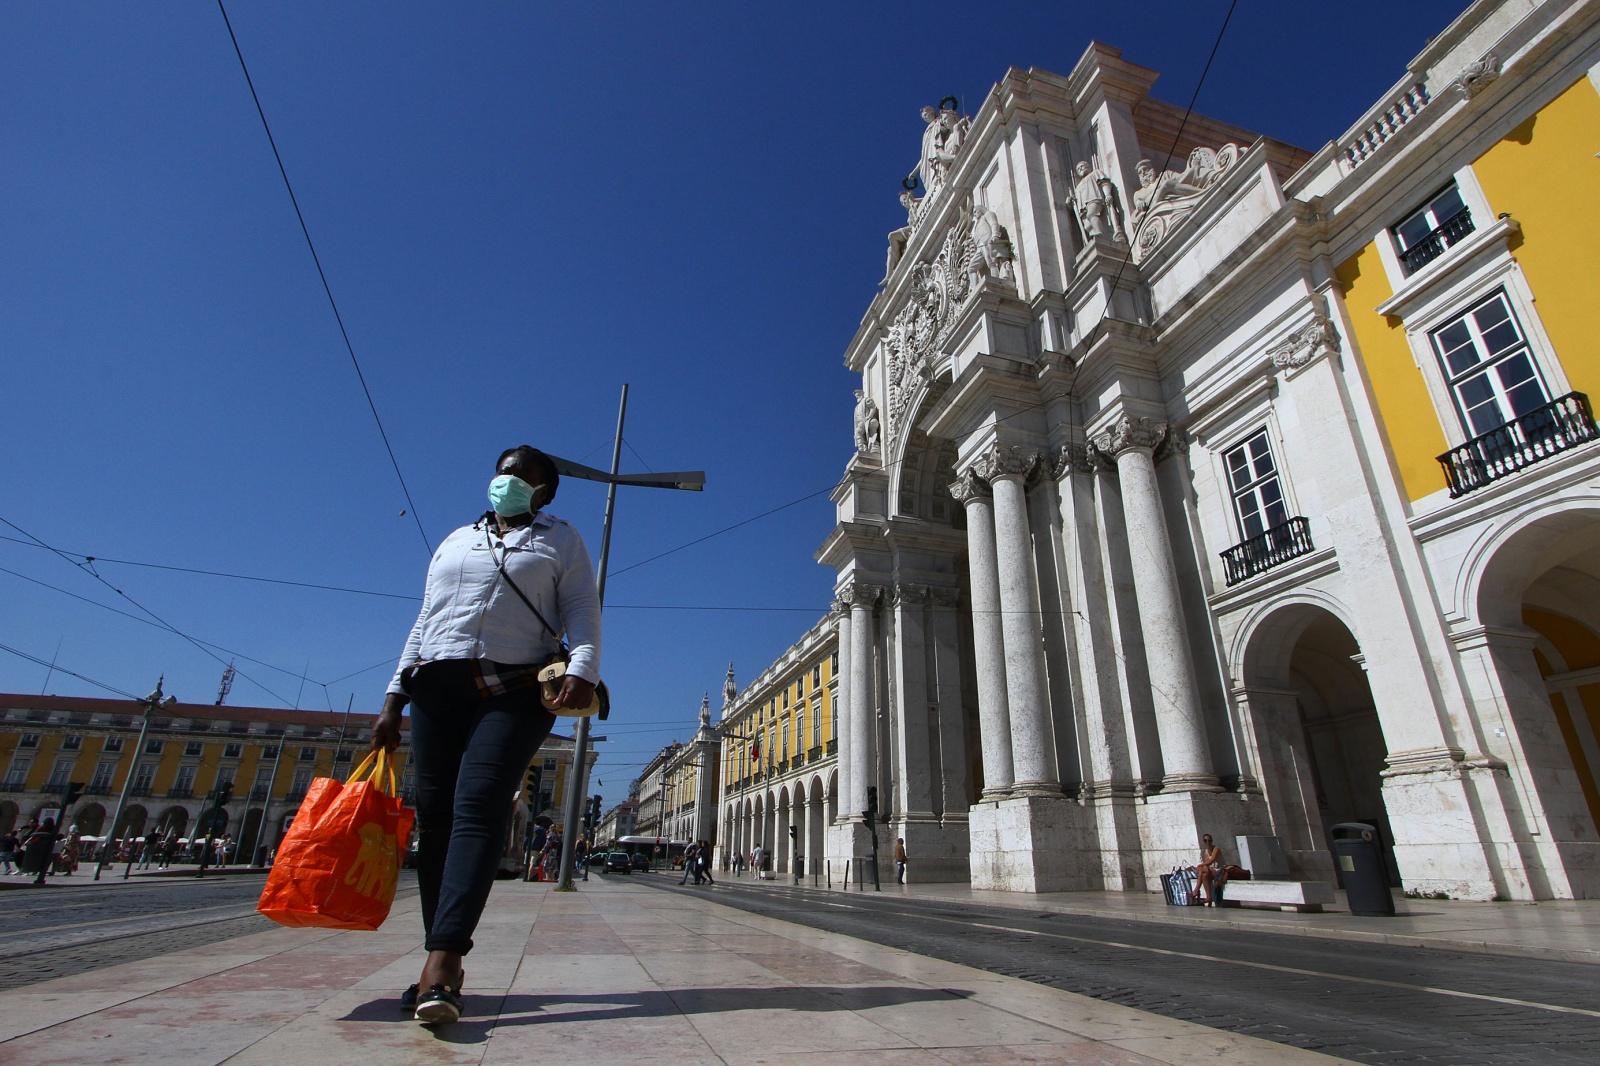 IMAGEM: Novo lockdown em Portugal